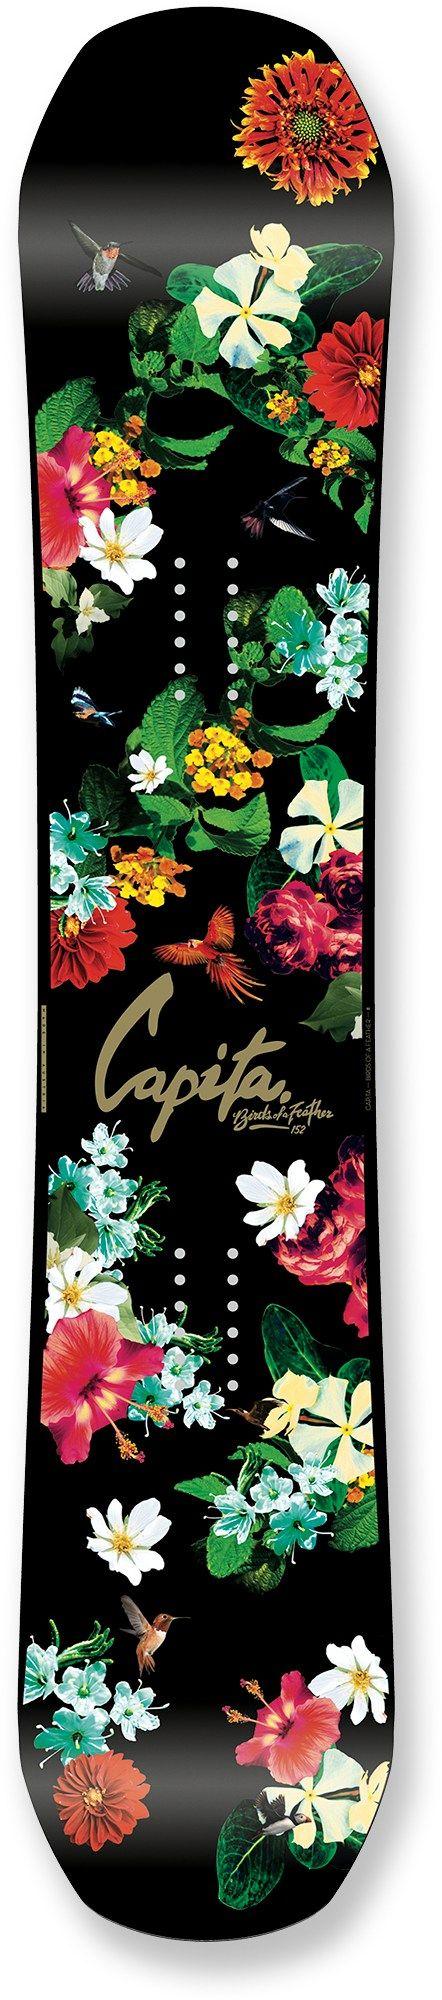 $250.00 | Capita Birds of a Feather Snowboard - Women's - omgggggg